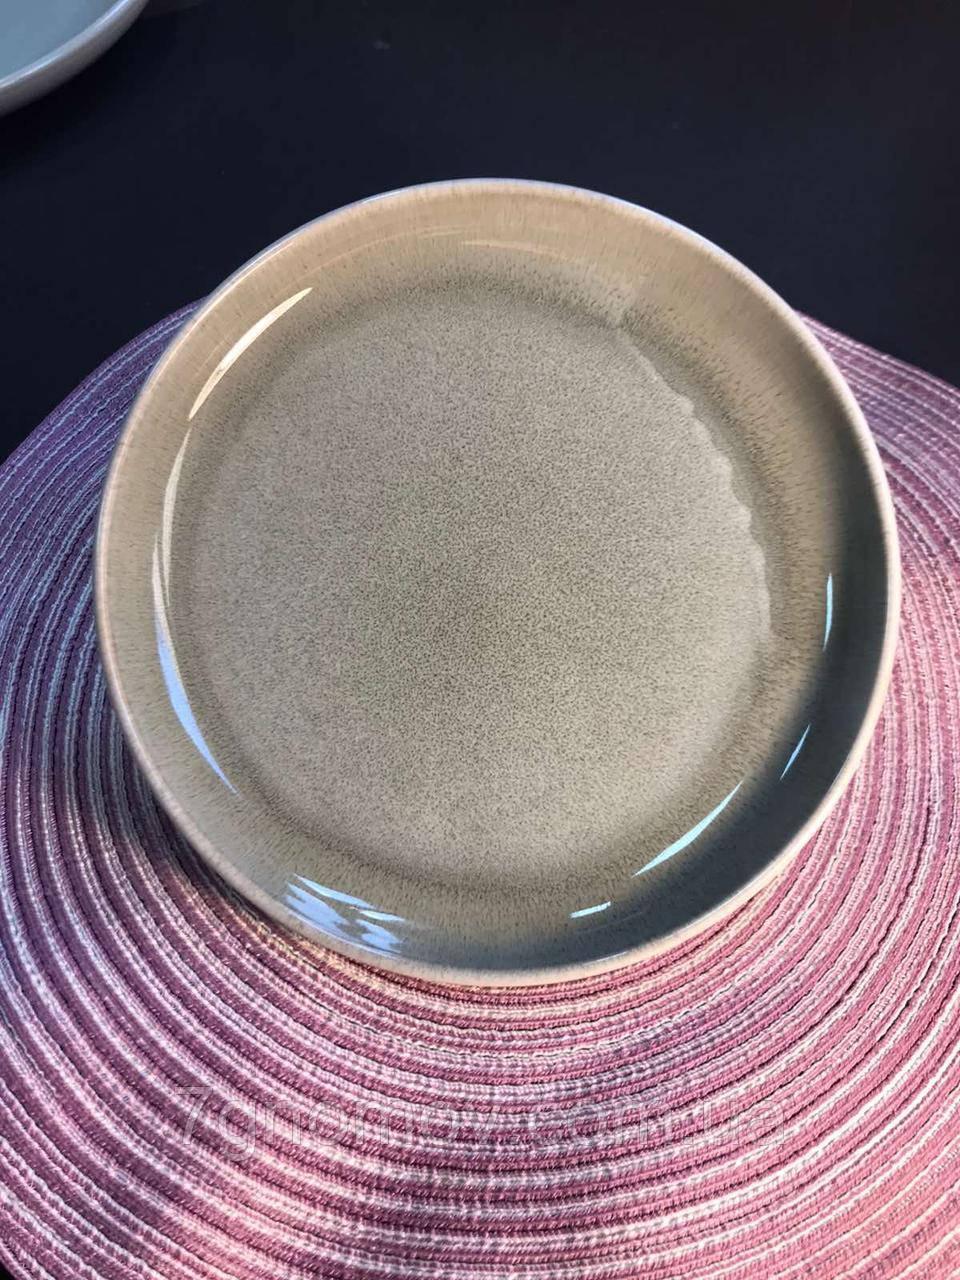 Набор 6 керамических тарелок бежево-серый Мрамор 21.5 см арт. 7953-12